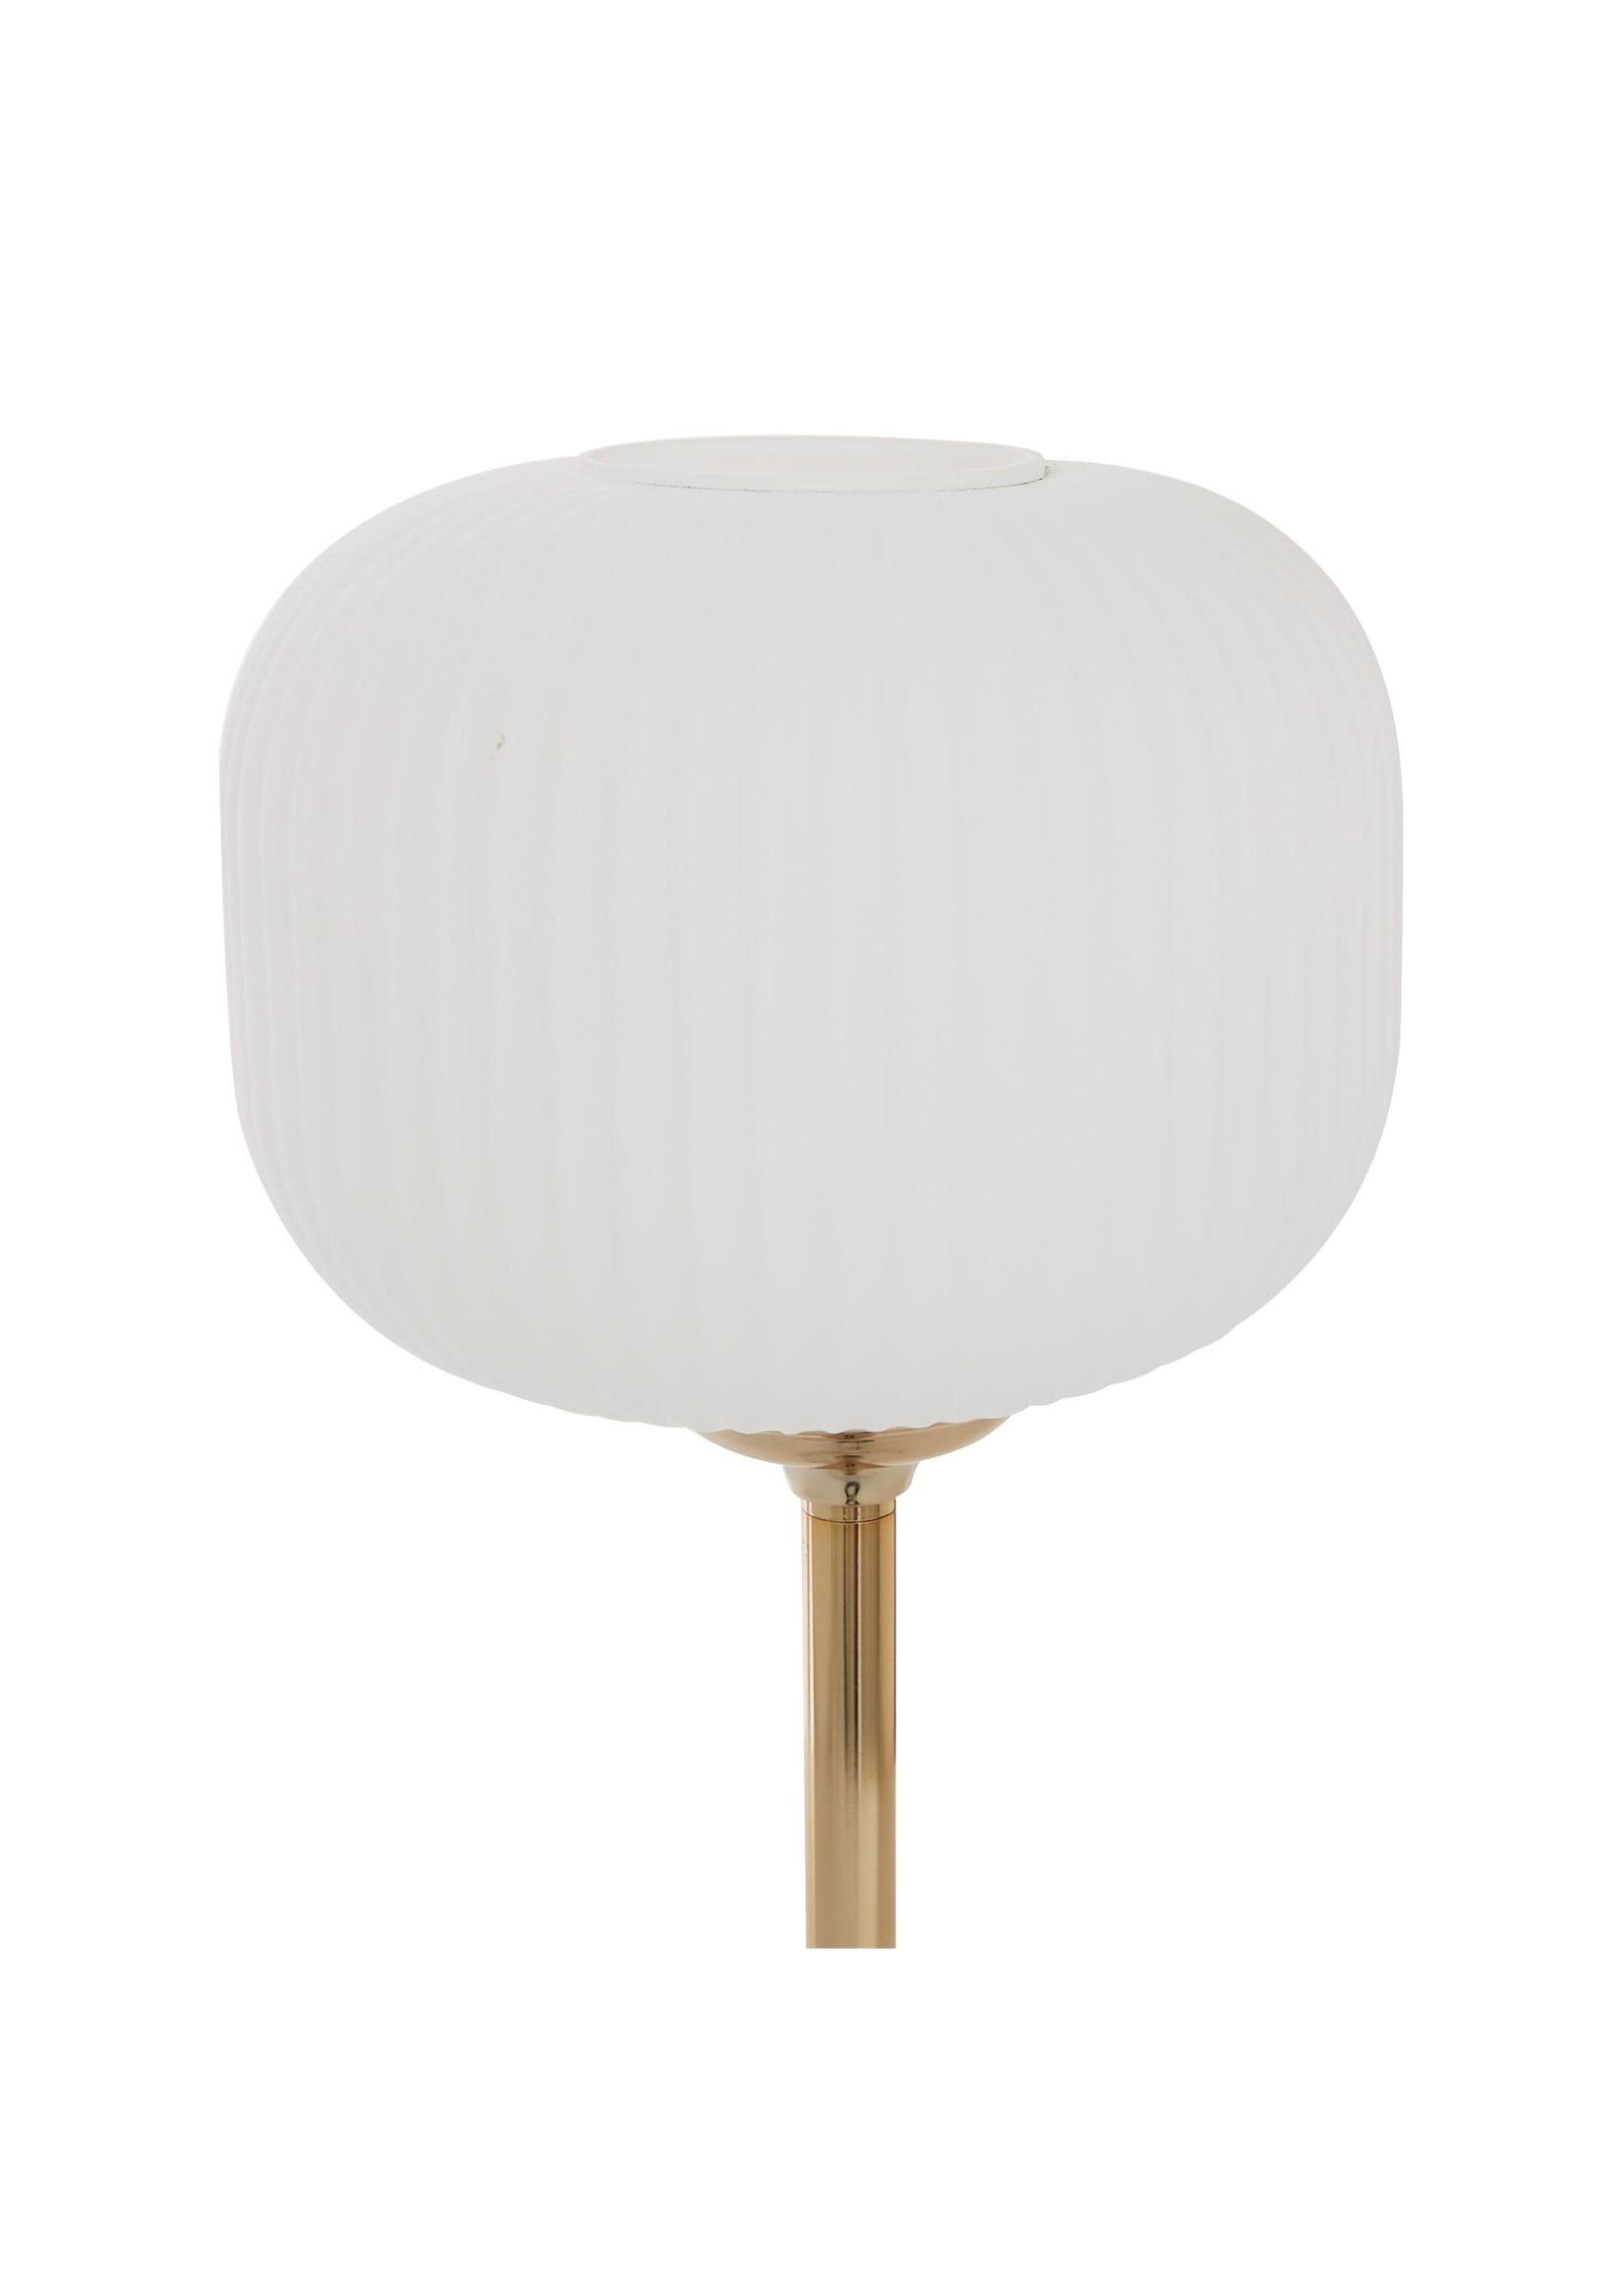 UMA Enterprises UMA Marble Metal Table Lamp 10x23